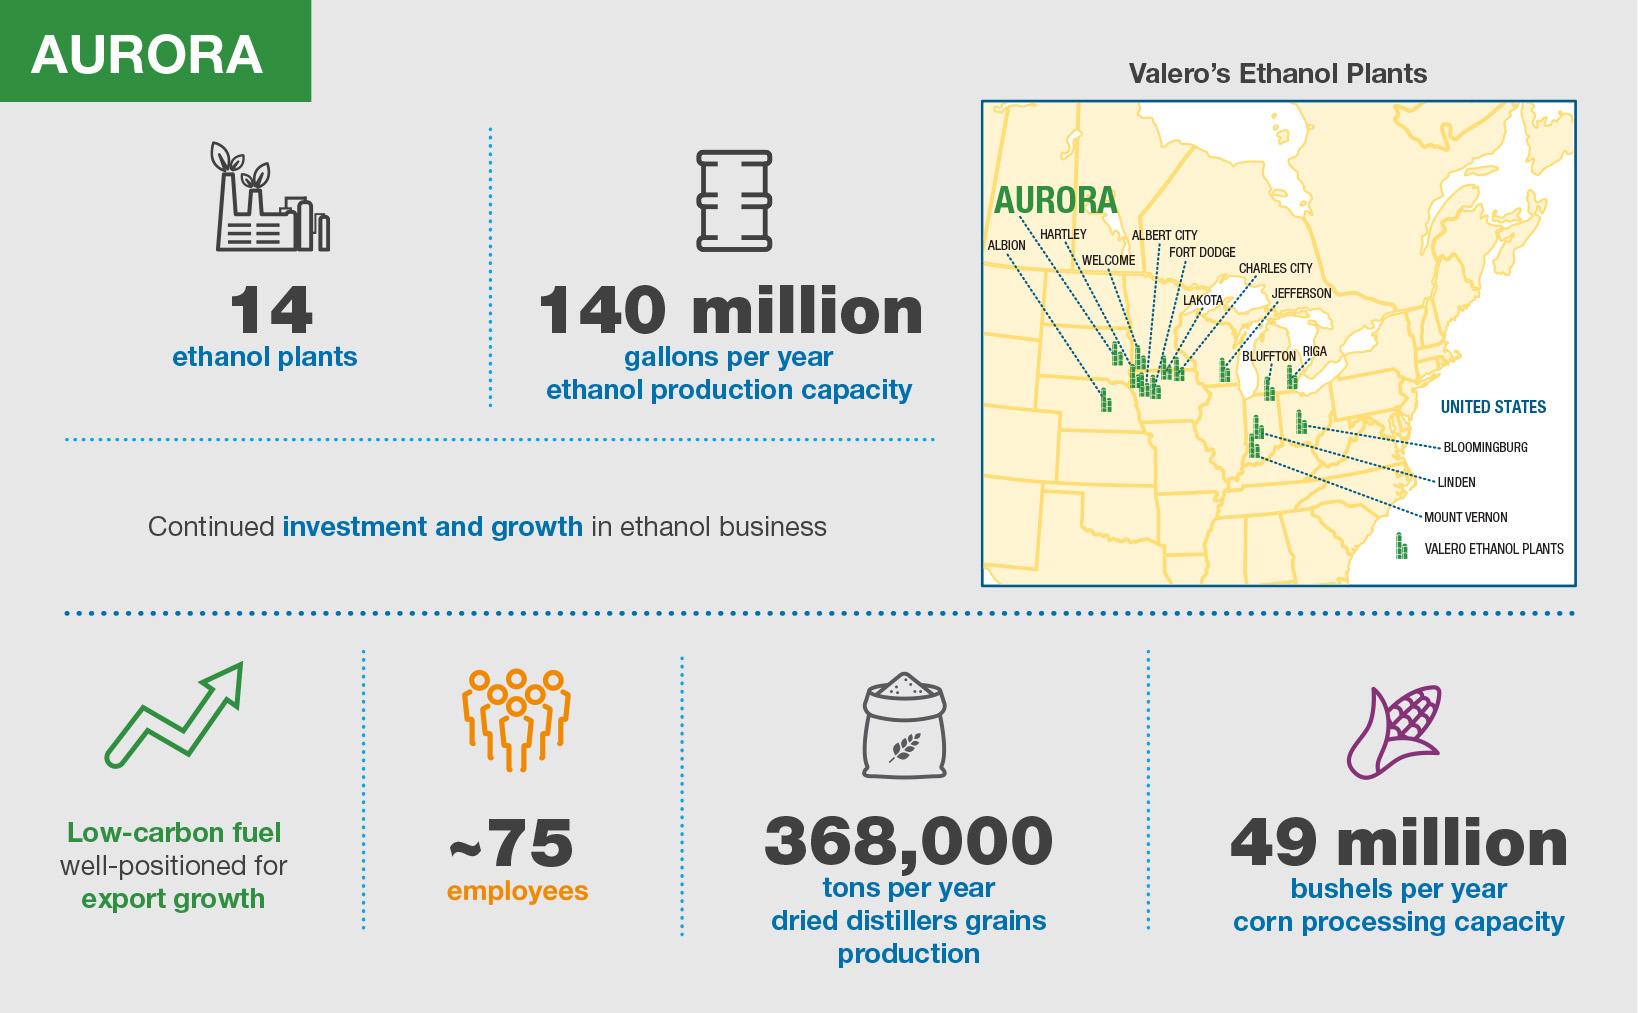 Valero Aurora Ethanol Plant Infographic